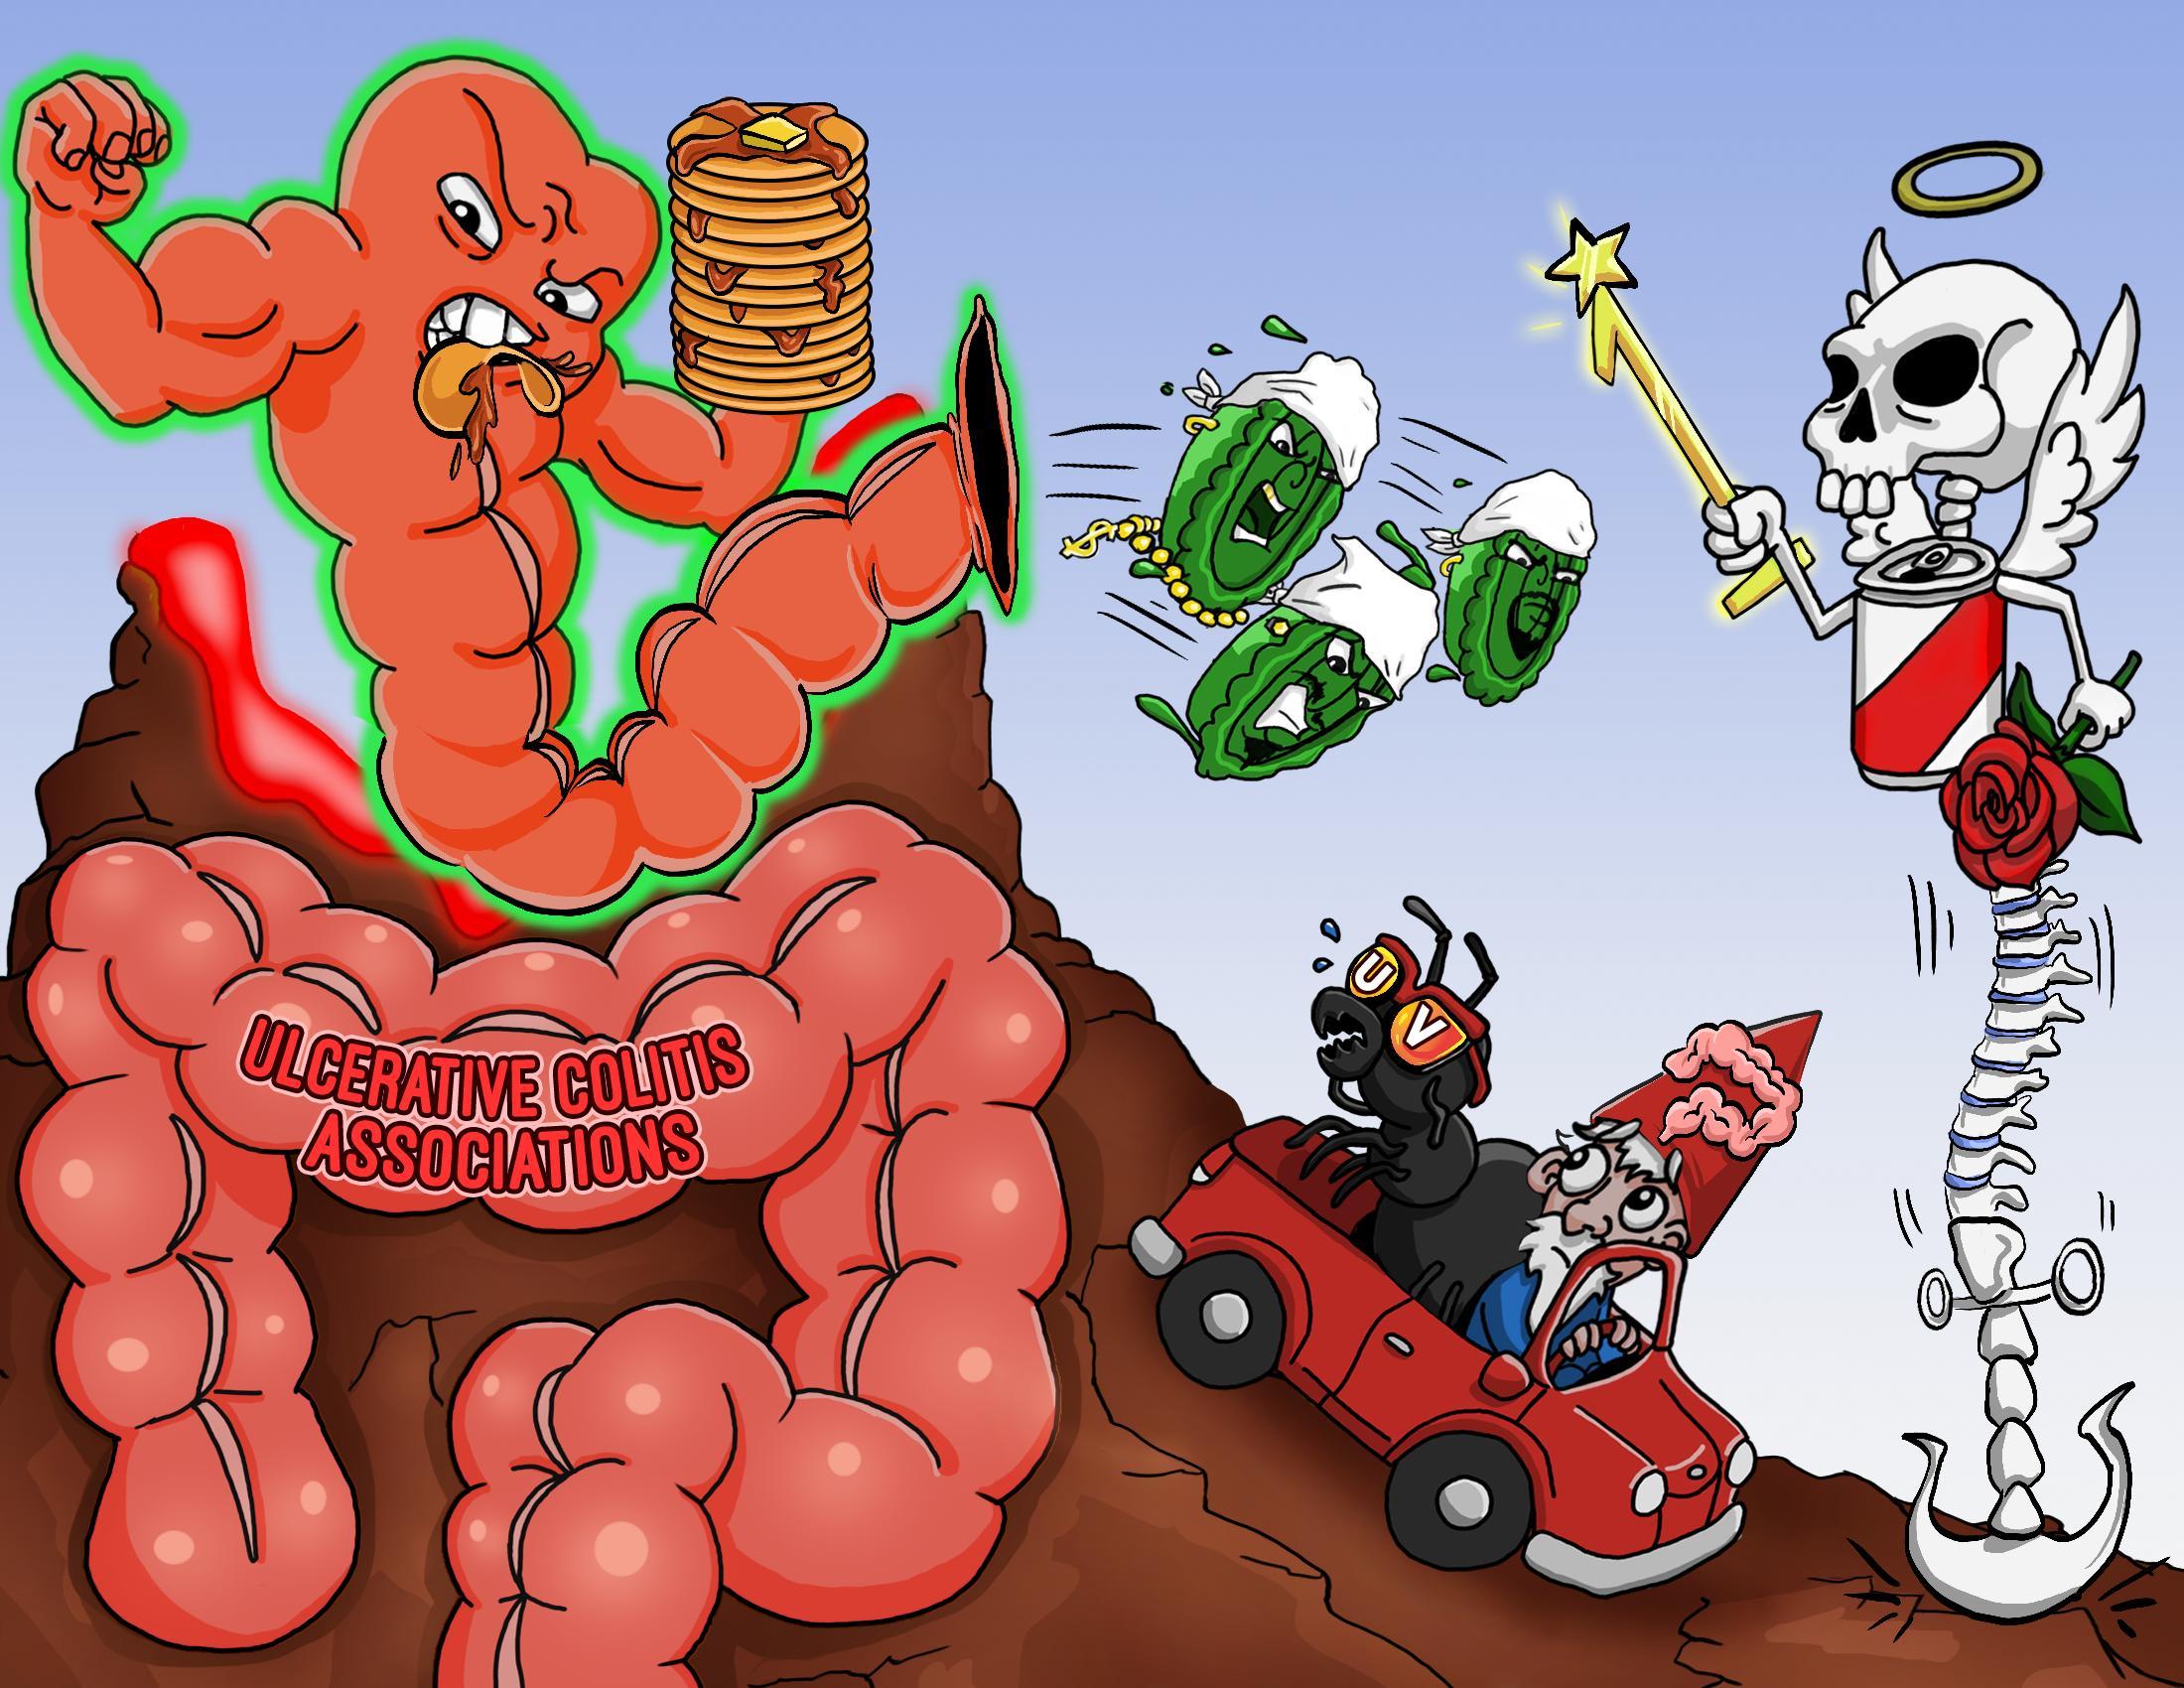 Ulcerative Colitis Associations